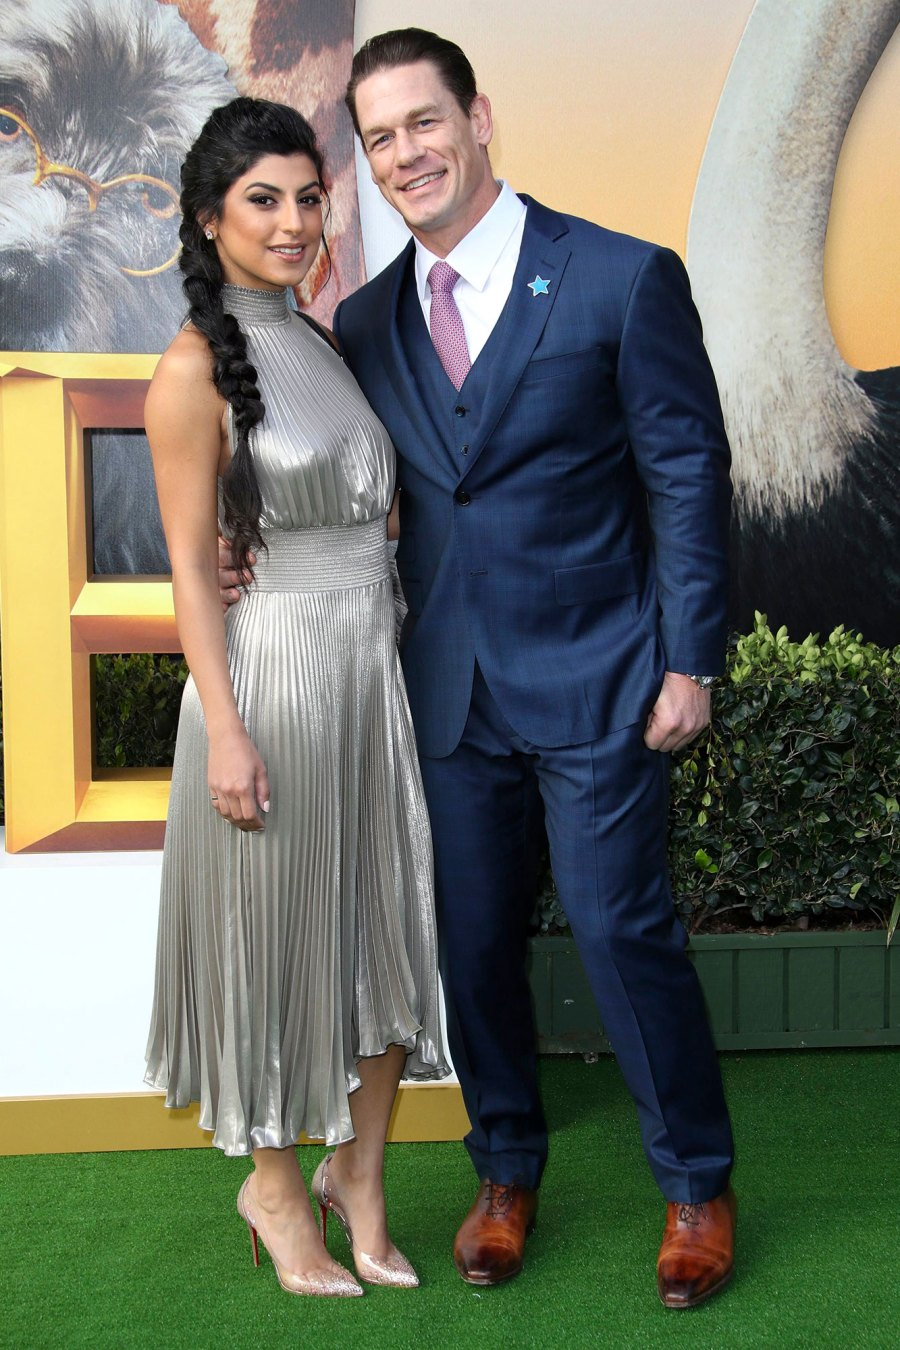 John Cena and Shay Shariatzadeh Relationship Timeline